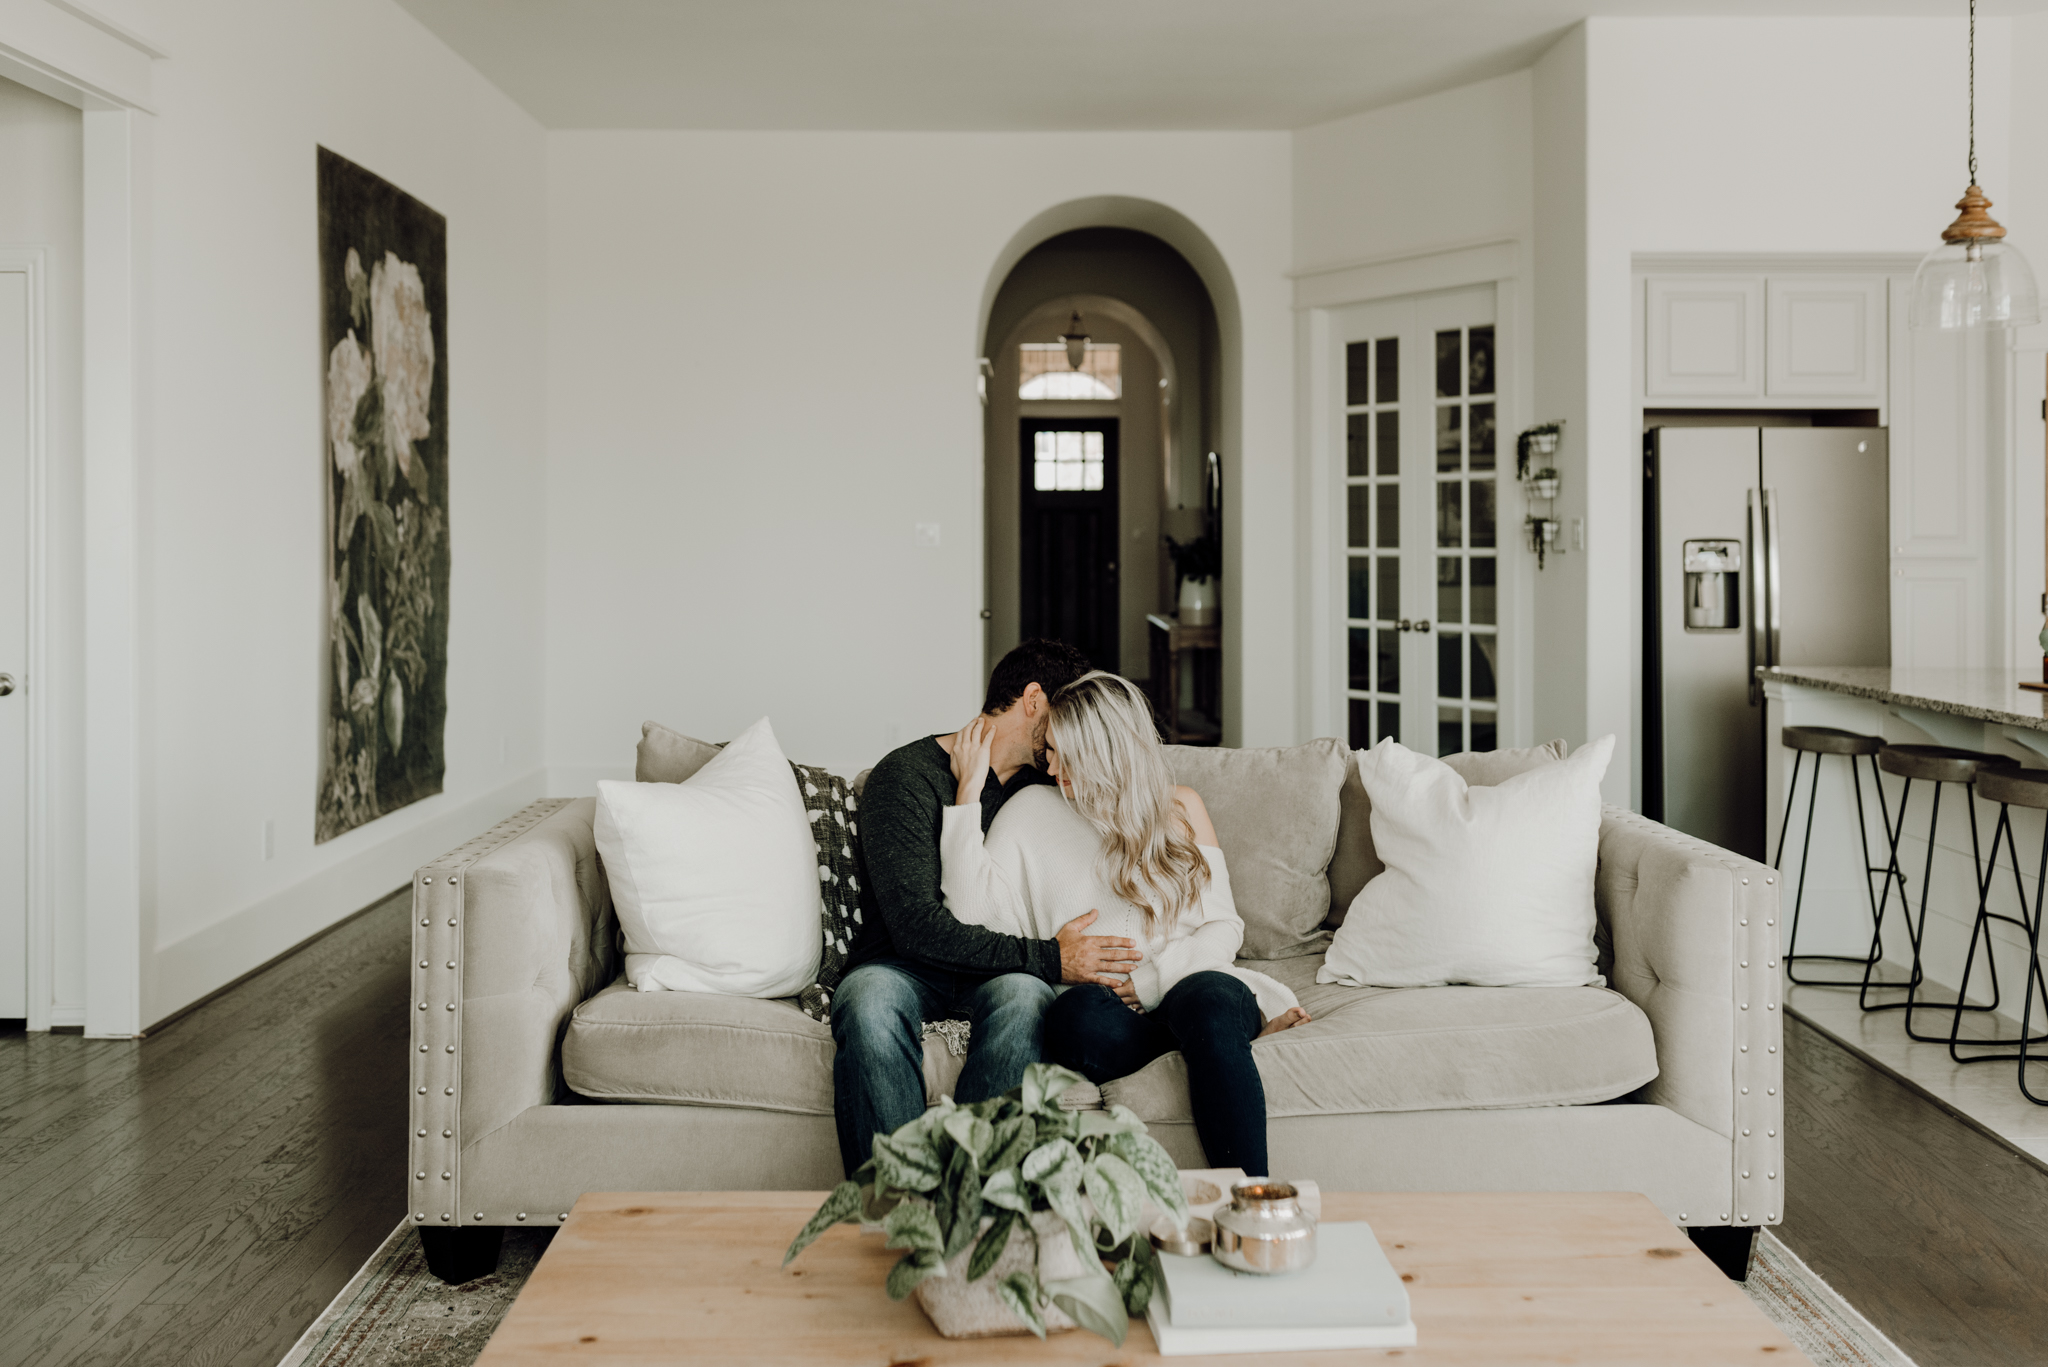 houston-wedding-photographer-in-home-maternity-session-puppies- Houston Wedding Photographer -Kristen Giles Photography-5.jpg